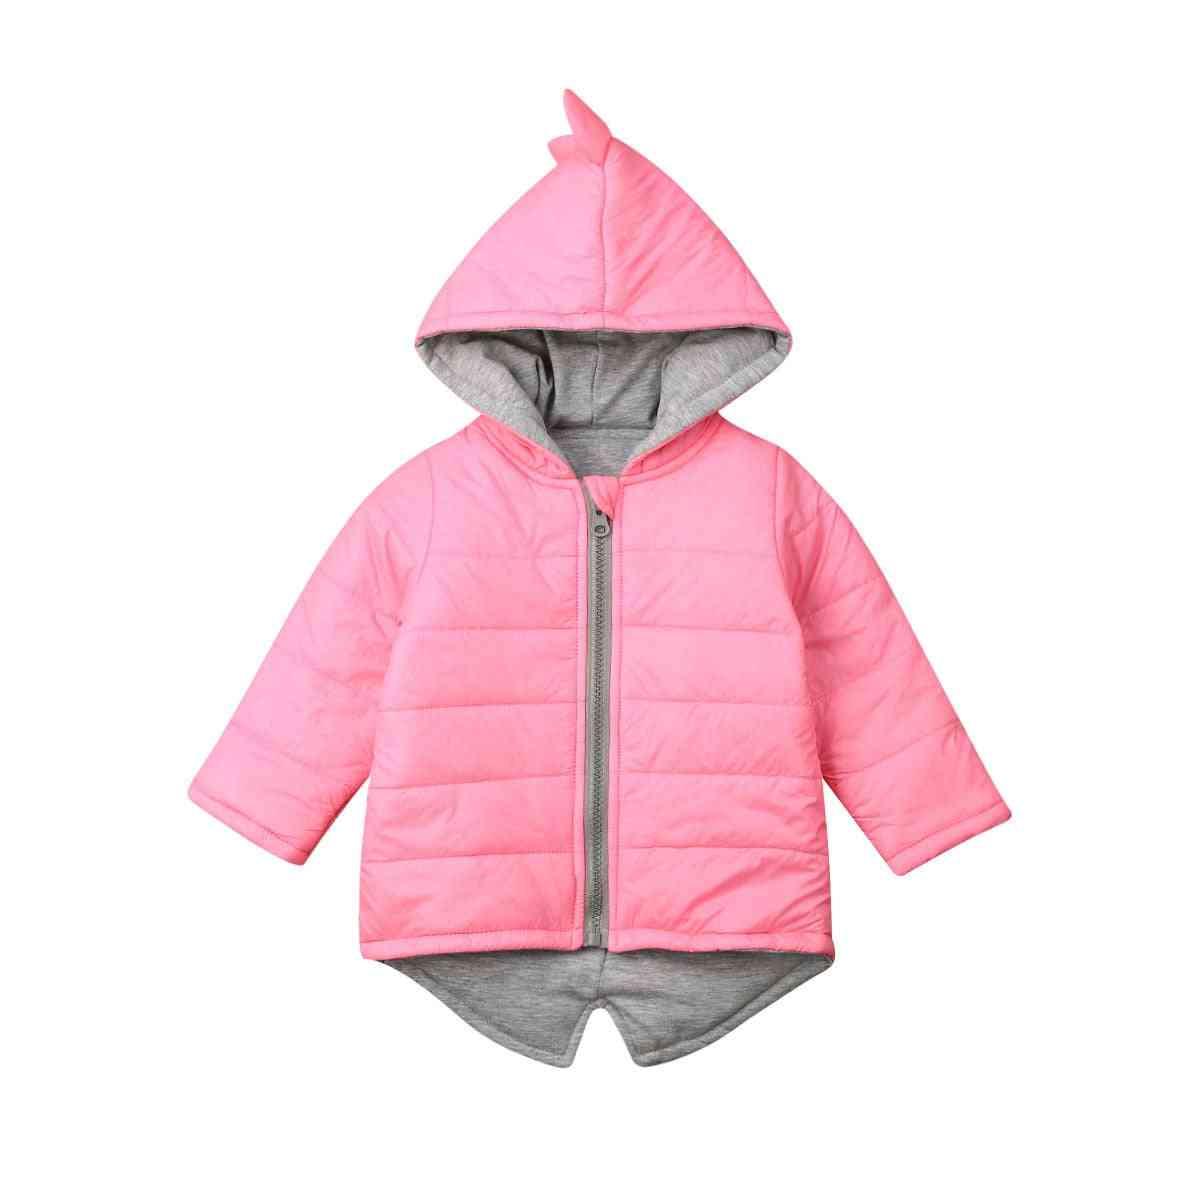 Dinosaur Cartoon Jacket For Boy And Girl, Thick Hoodie Zipper Coat